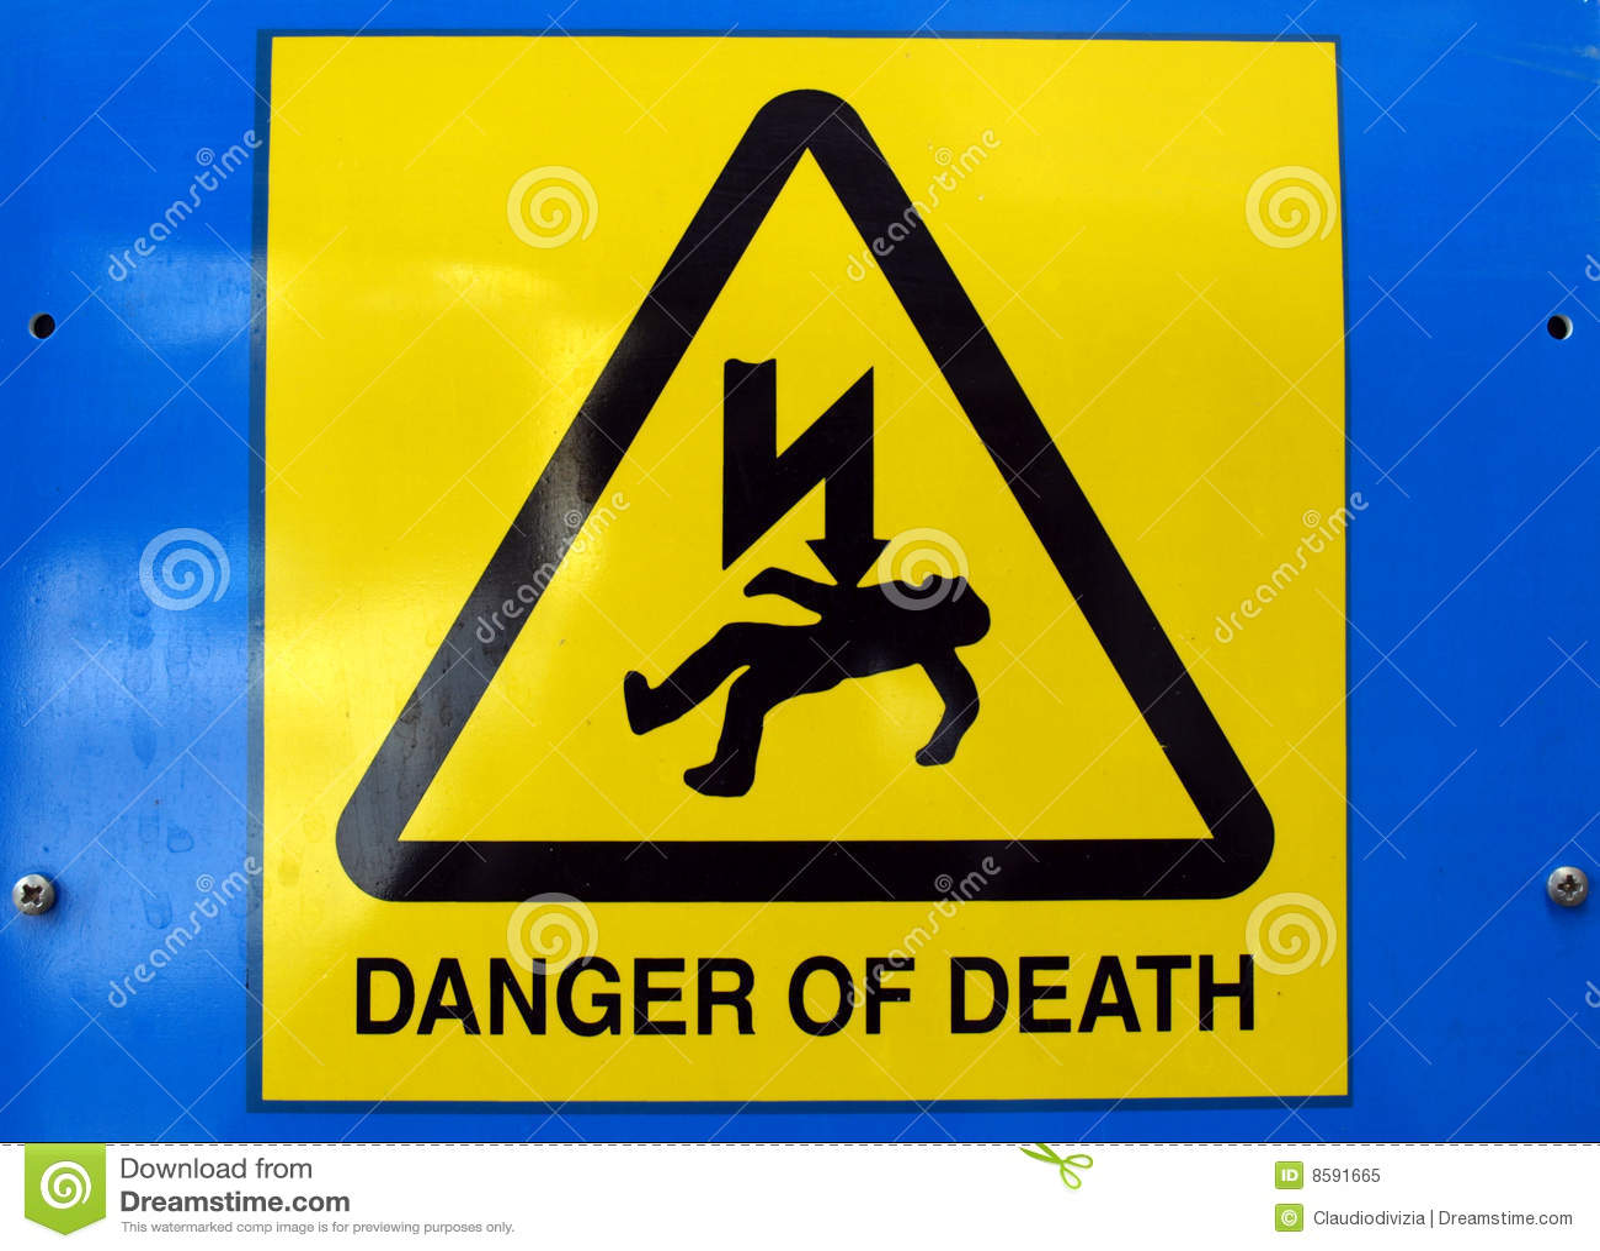 Danger of death electric shock stock image image of danger symbol danger of death electric shock buycottarizona Images